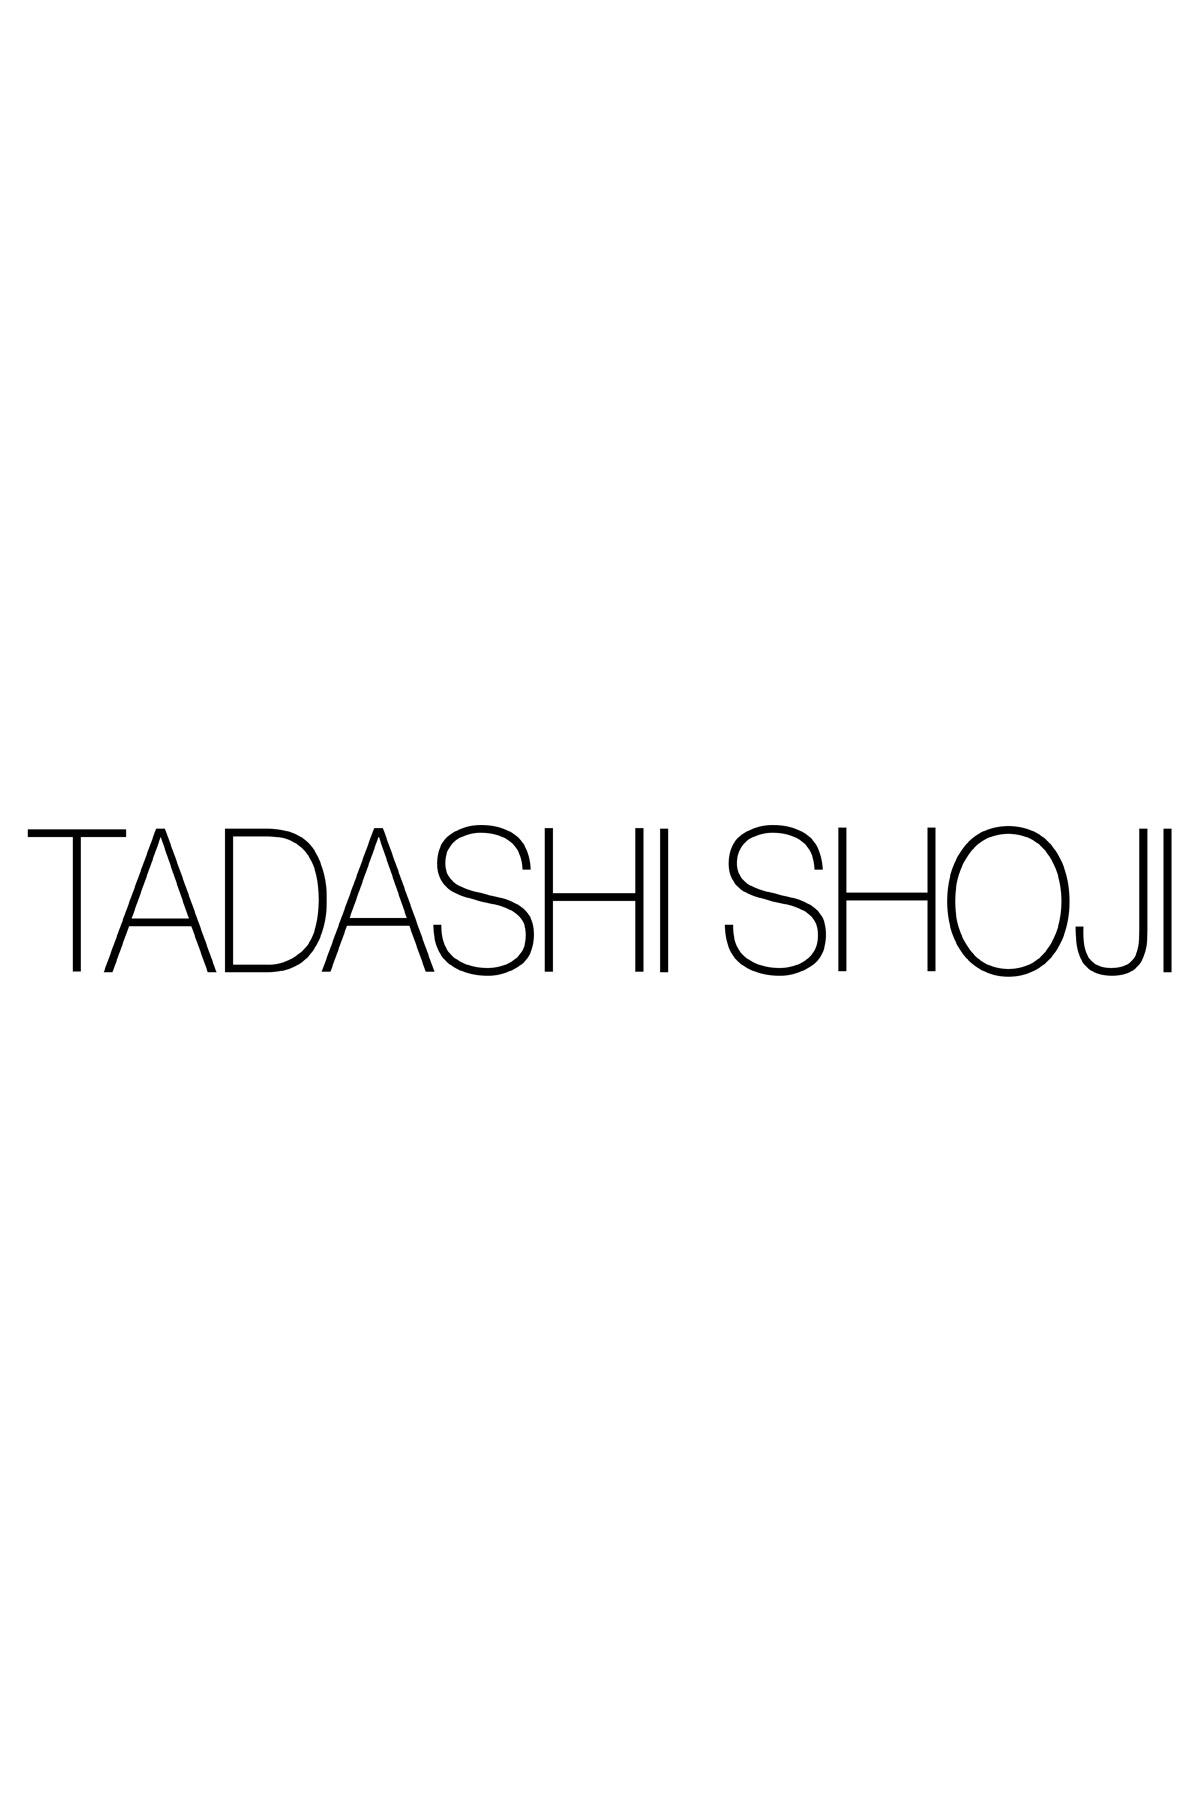 Washed Velvet Blouson Back Gown in Taupe   Tadashi Shoji